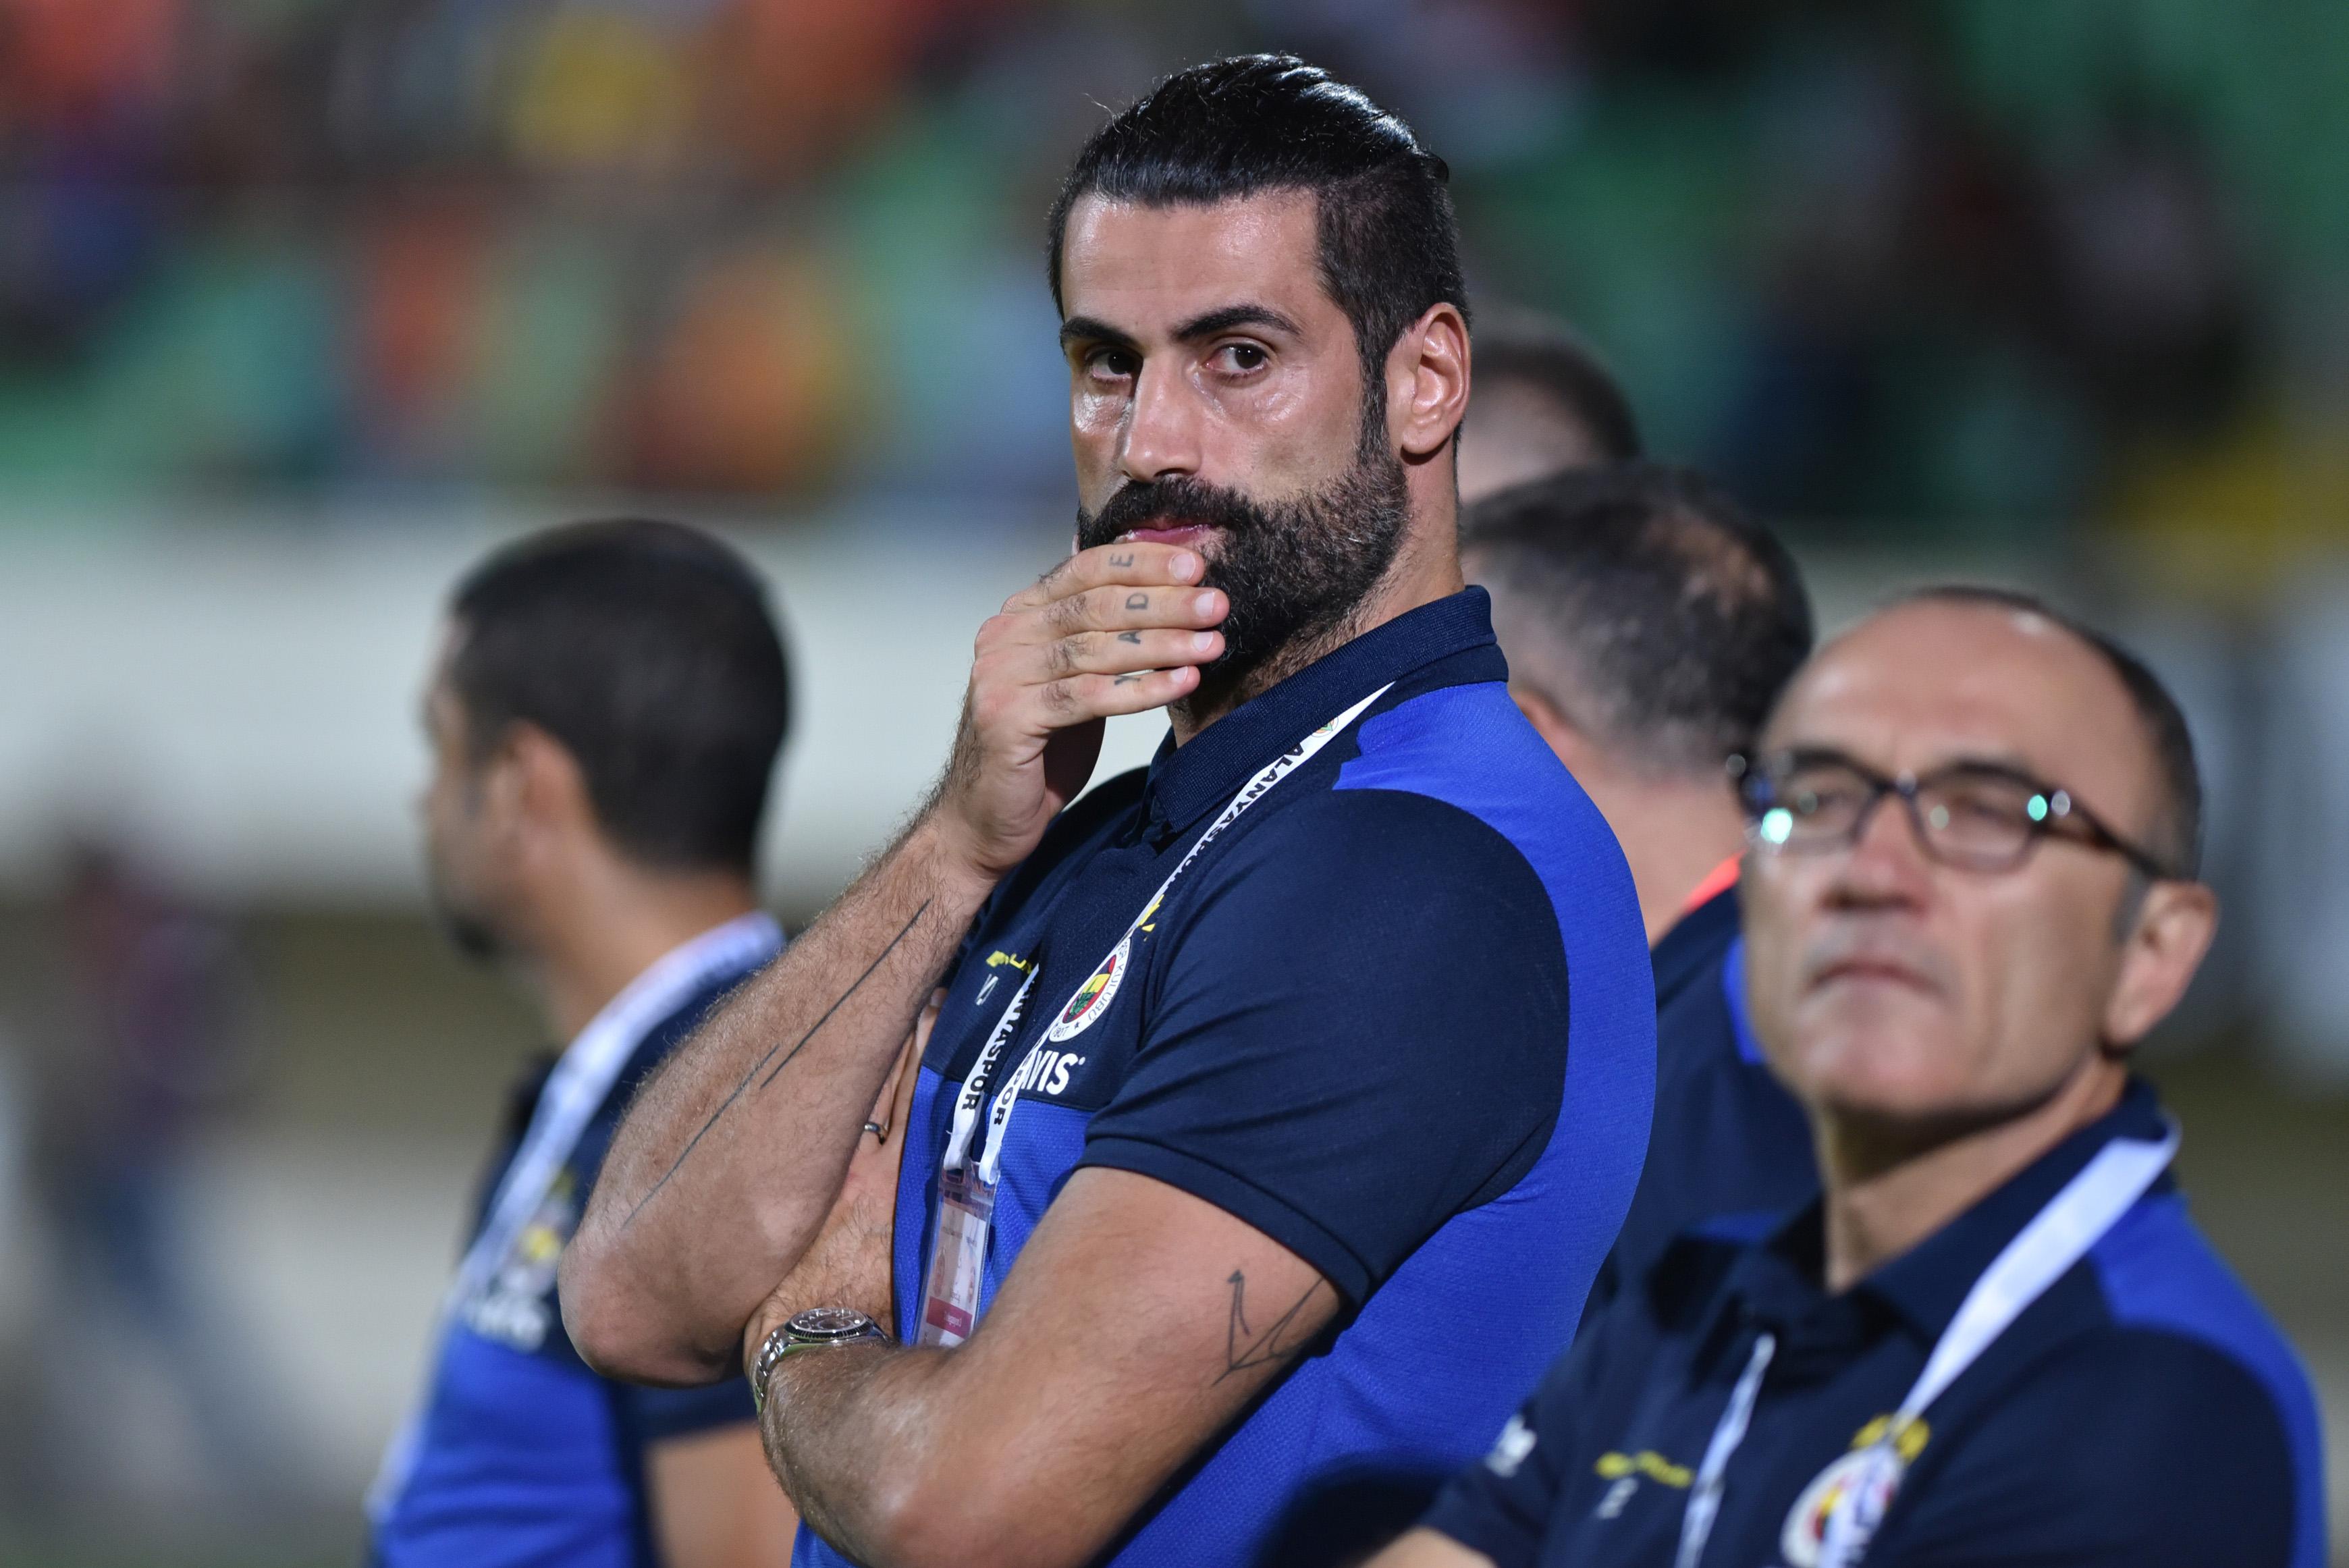 Fenerbahçe, Alanya'da 3 golle kaybetti